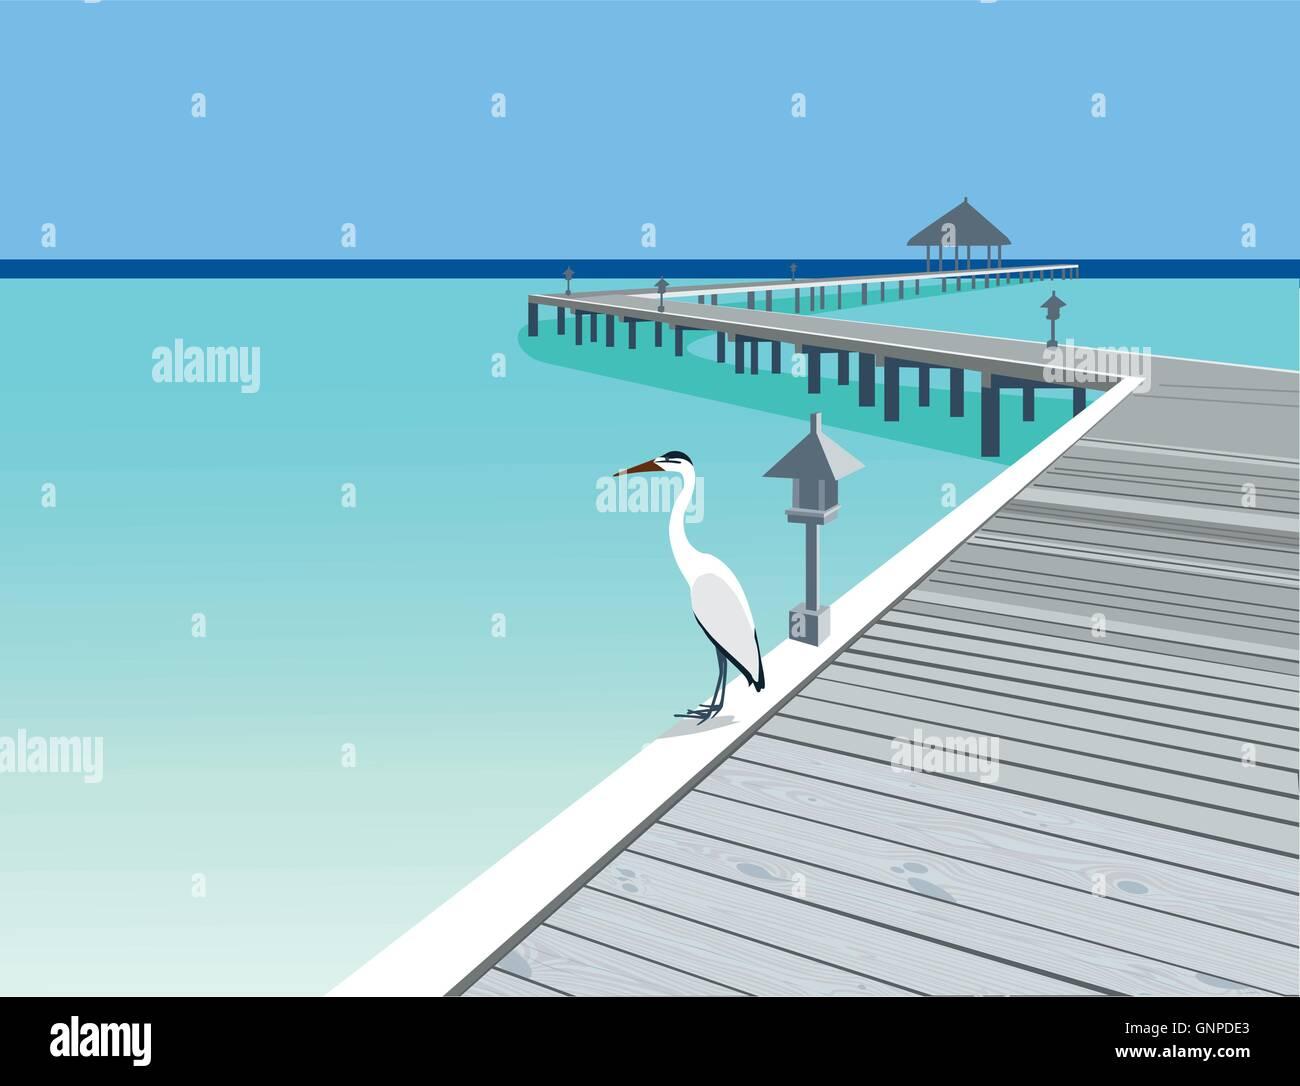 Heron is on the tropical resort wooden pier vector illustration - Stock Vector